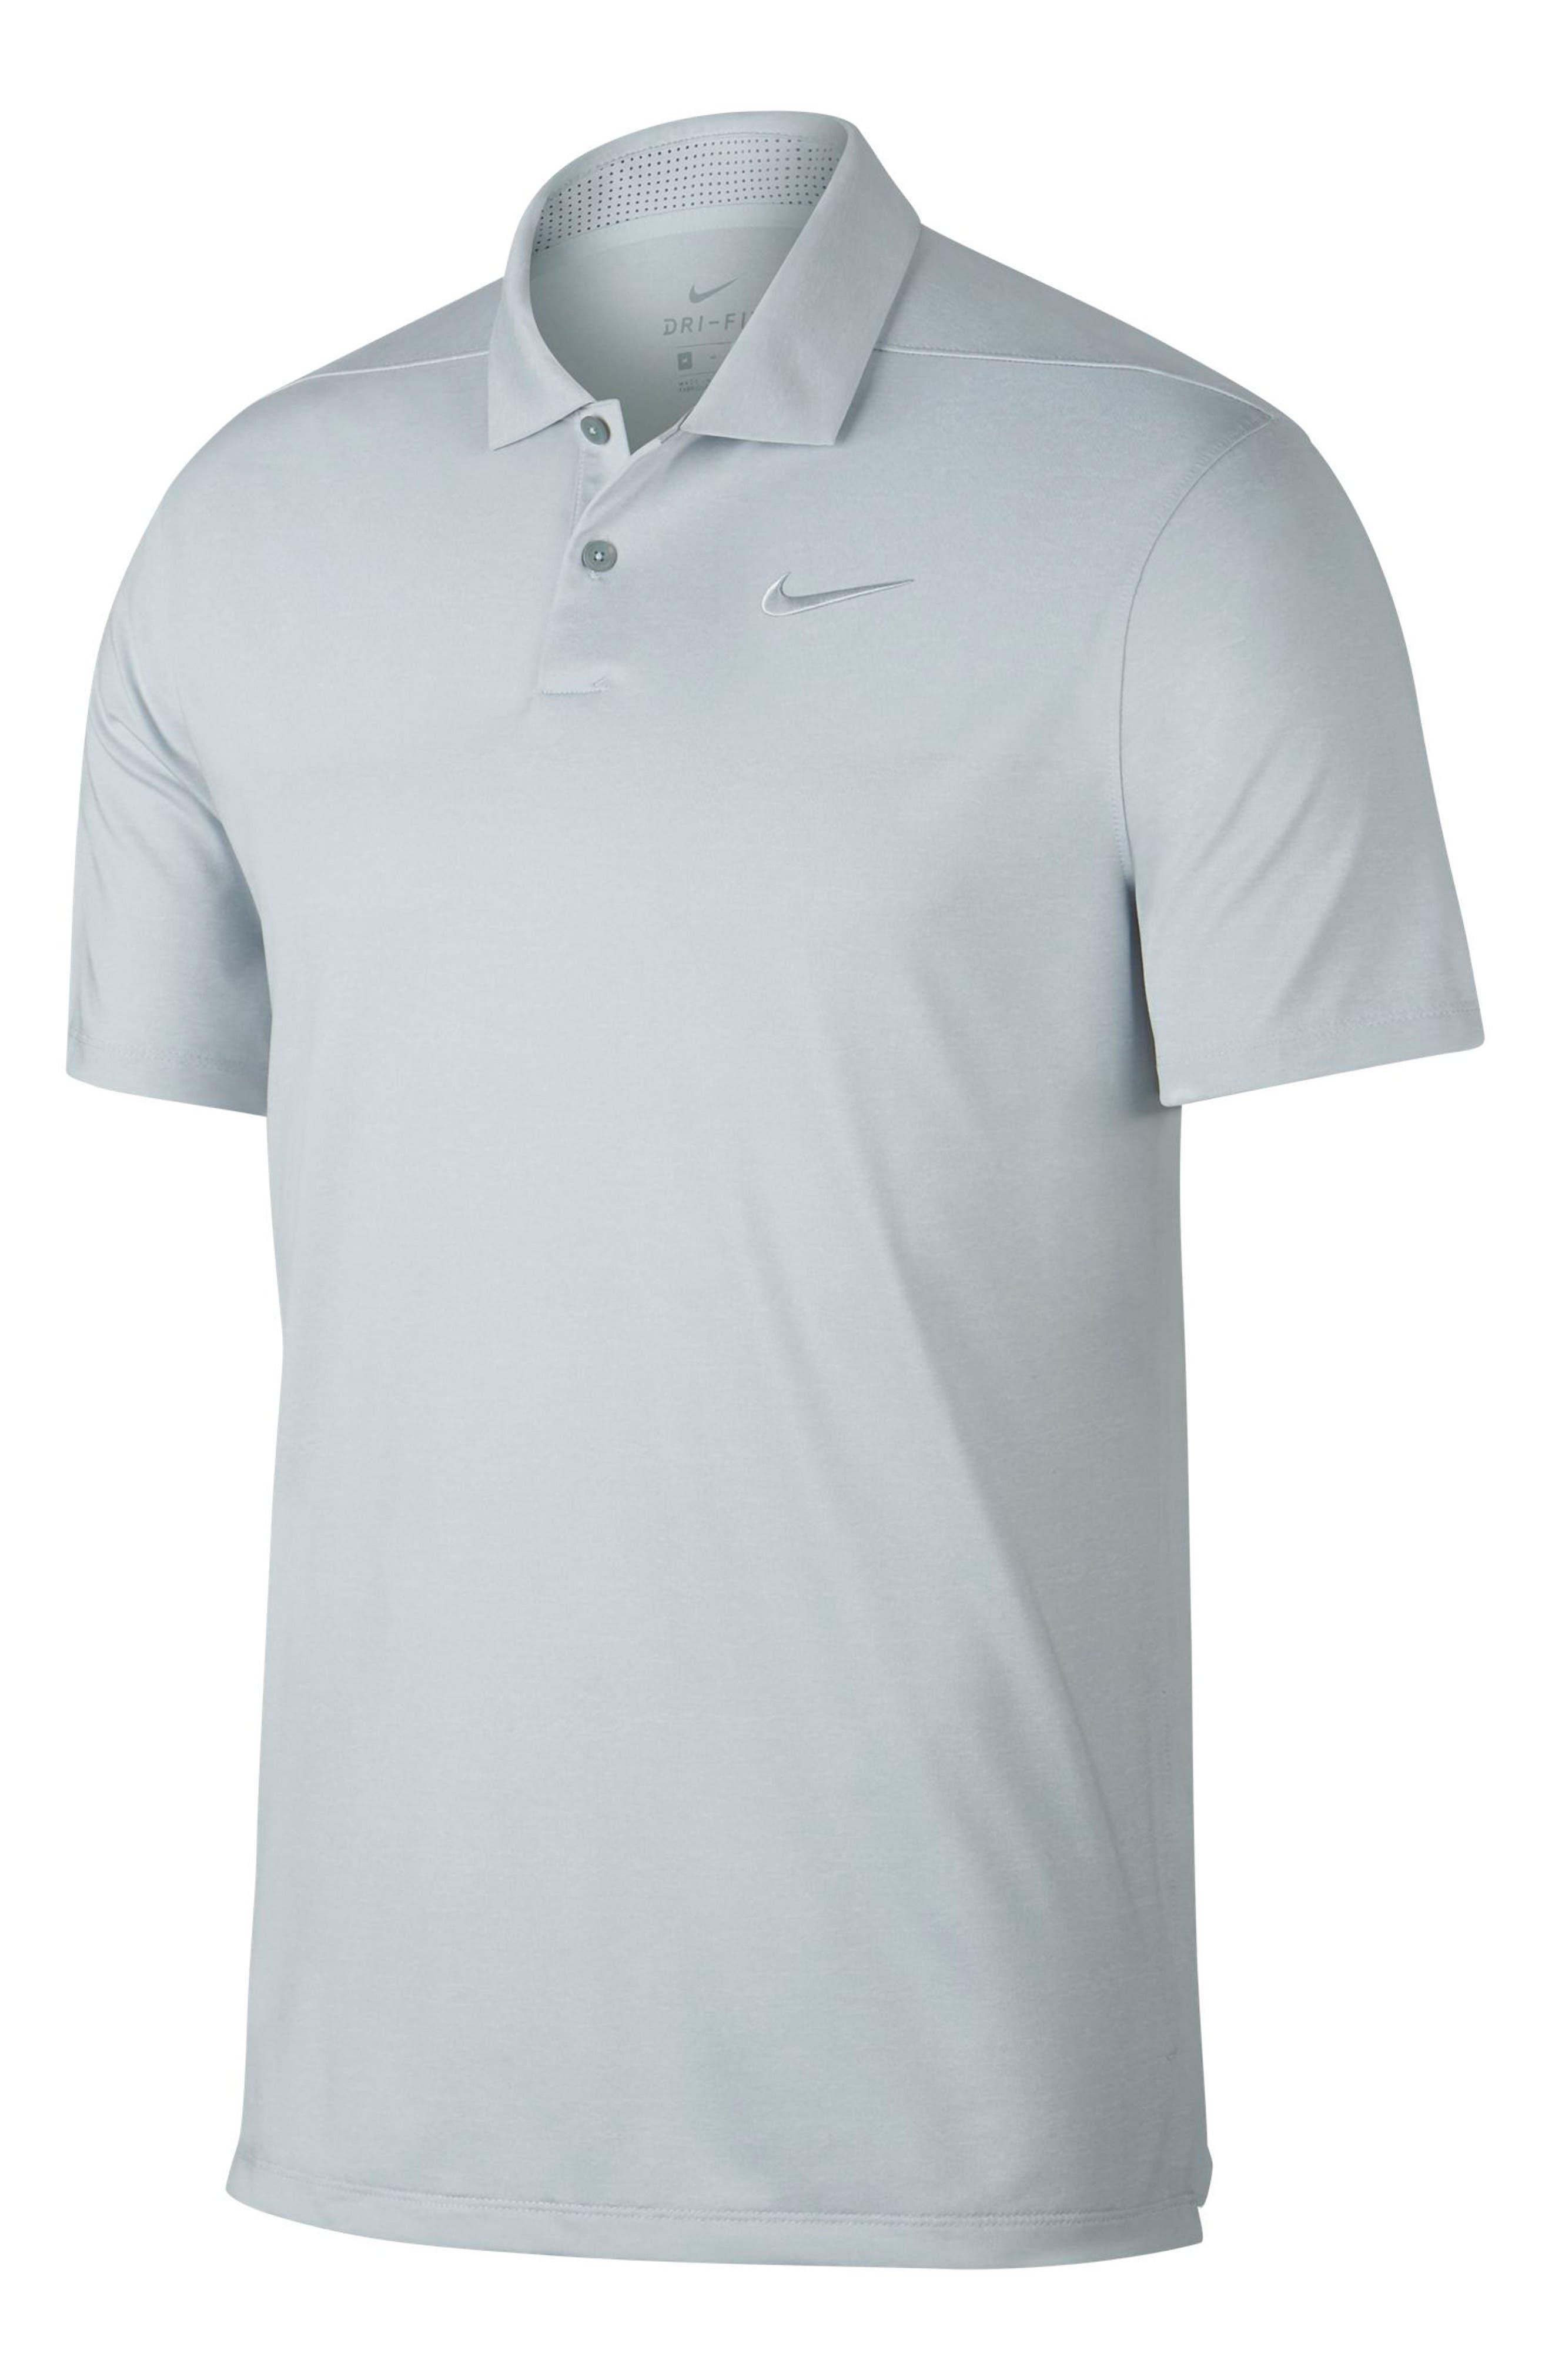 NIKE Vapor Dri-FIT Golf Polo, Main, color, PURE PLATINUM/ PURE